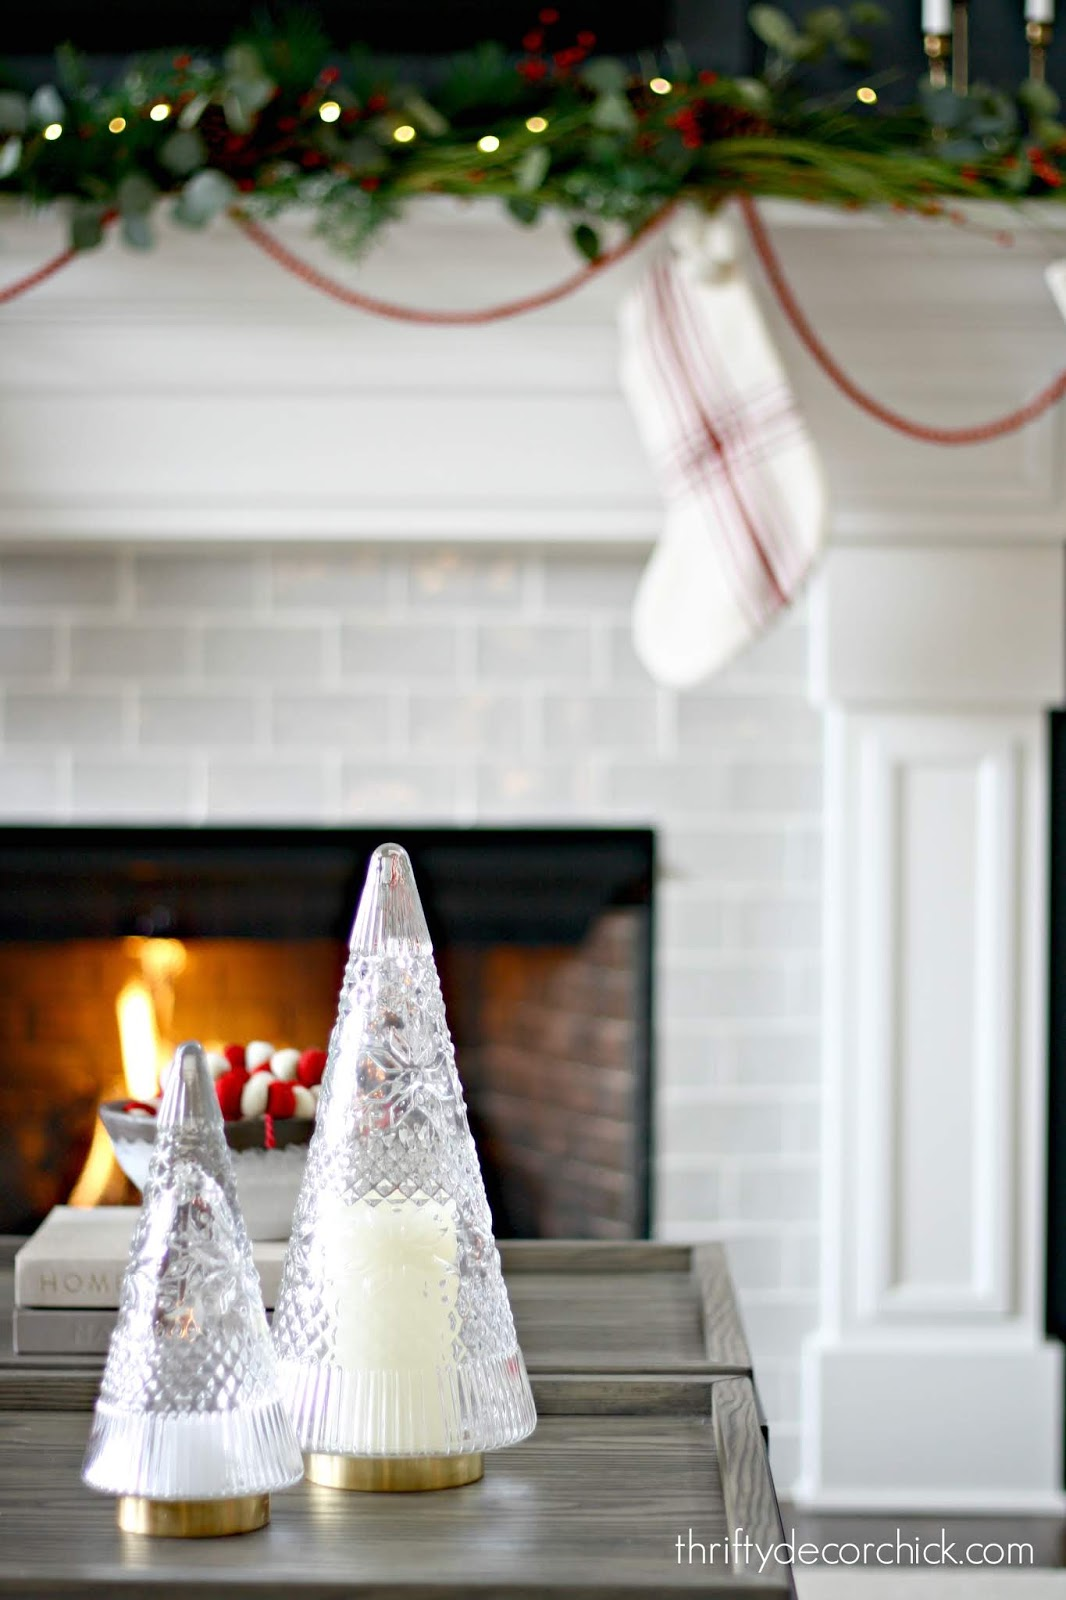 Glass Christmas tree candle holders